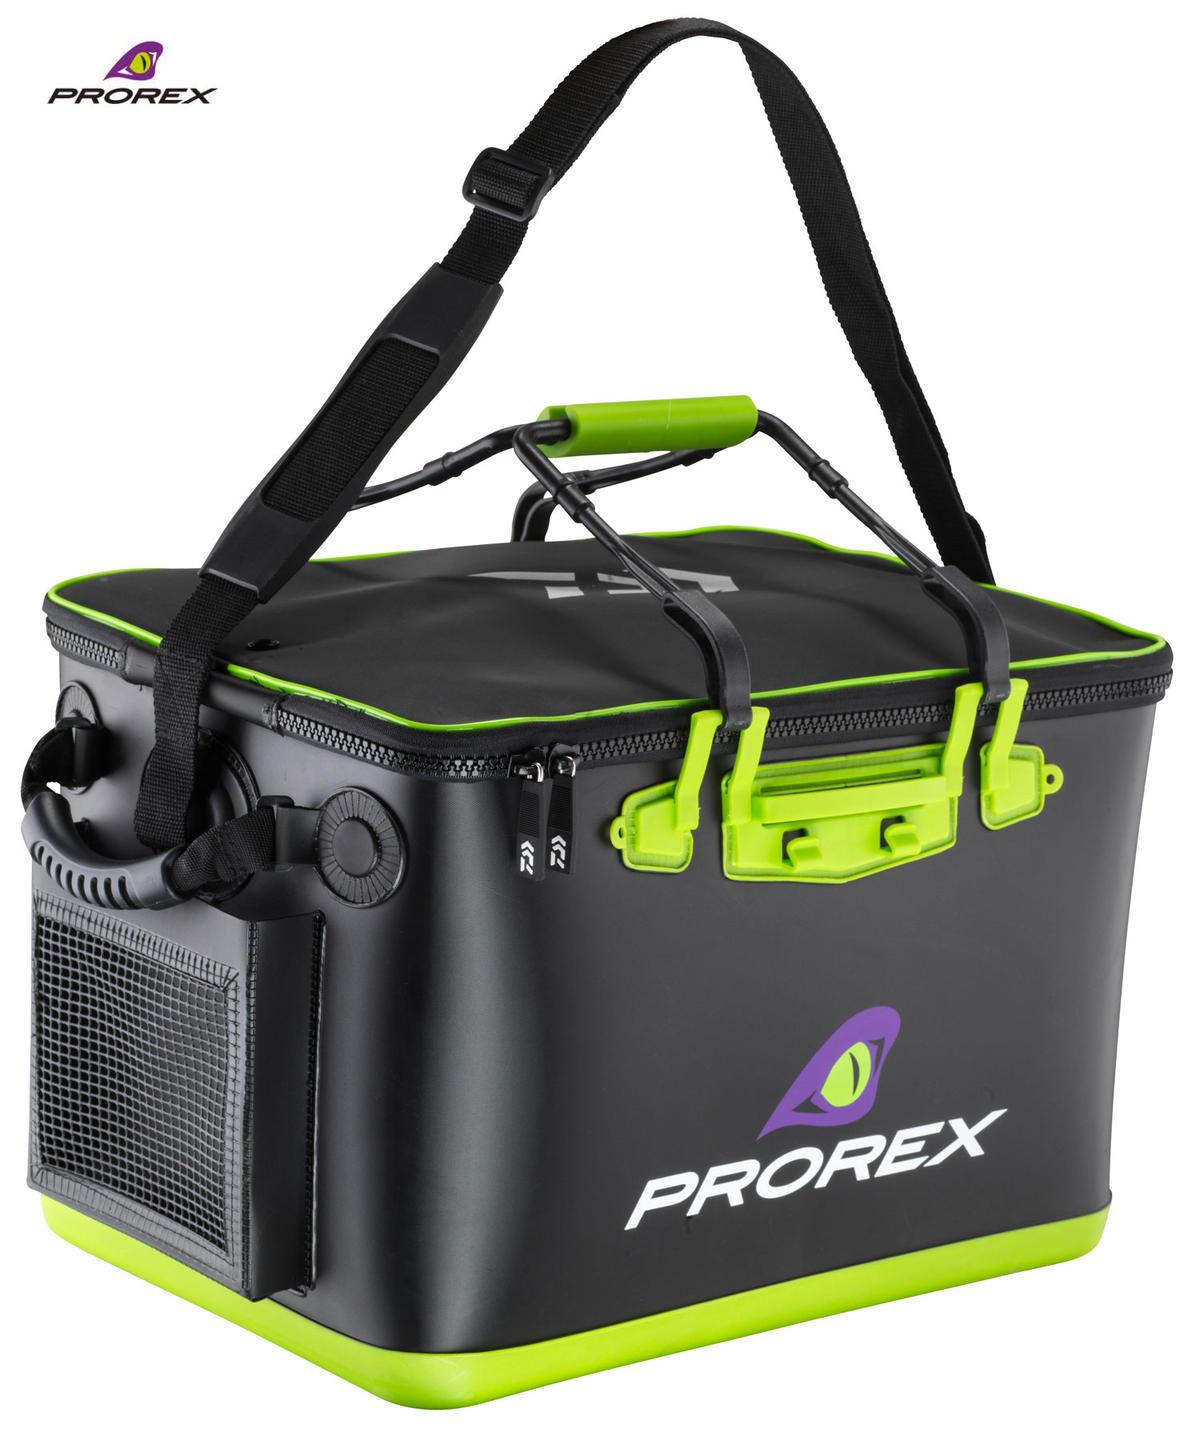 New Daiwa Prorex Tackle Container XL  - Pike / Predator - 15809-500